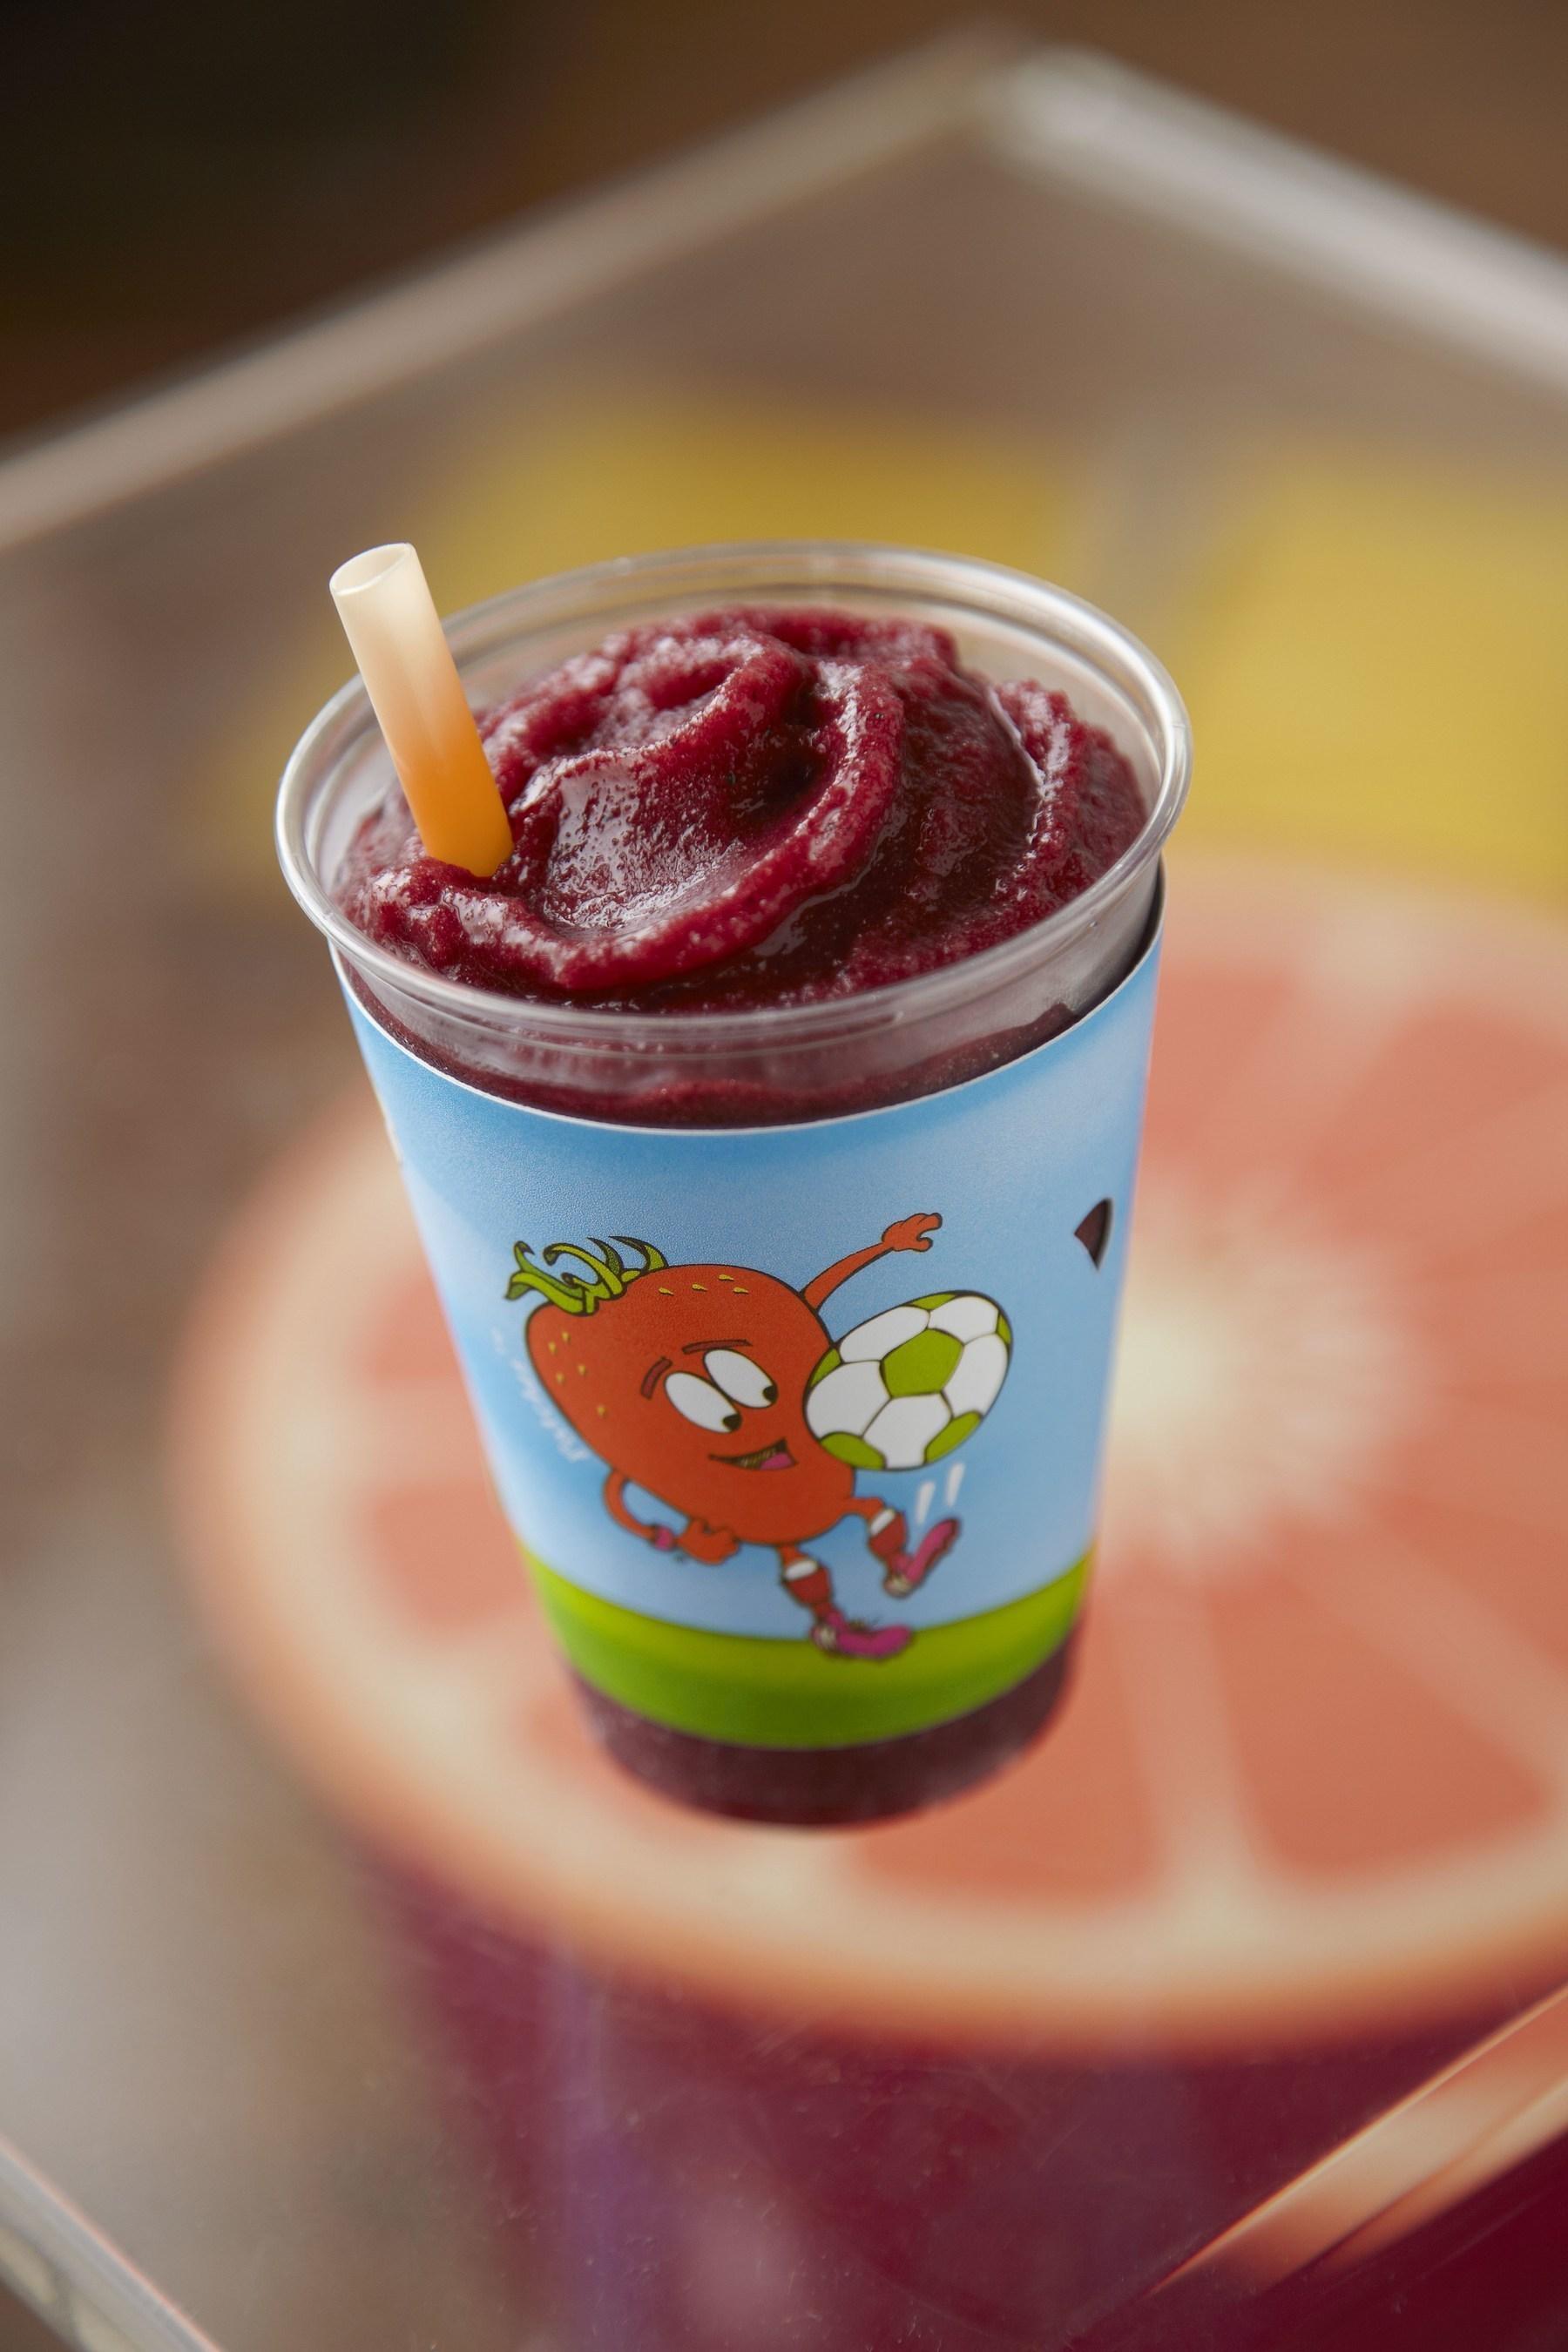 Jamba Juice Offers a Healthy Halloween